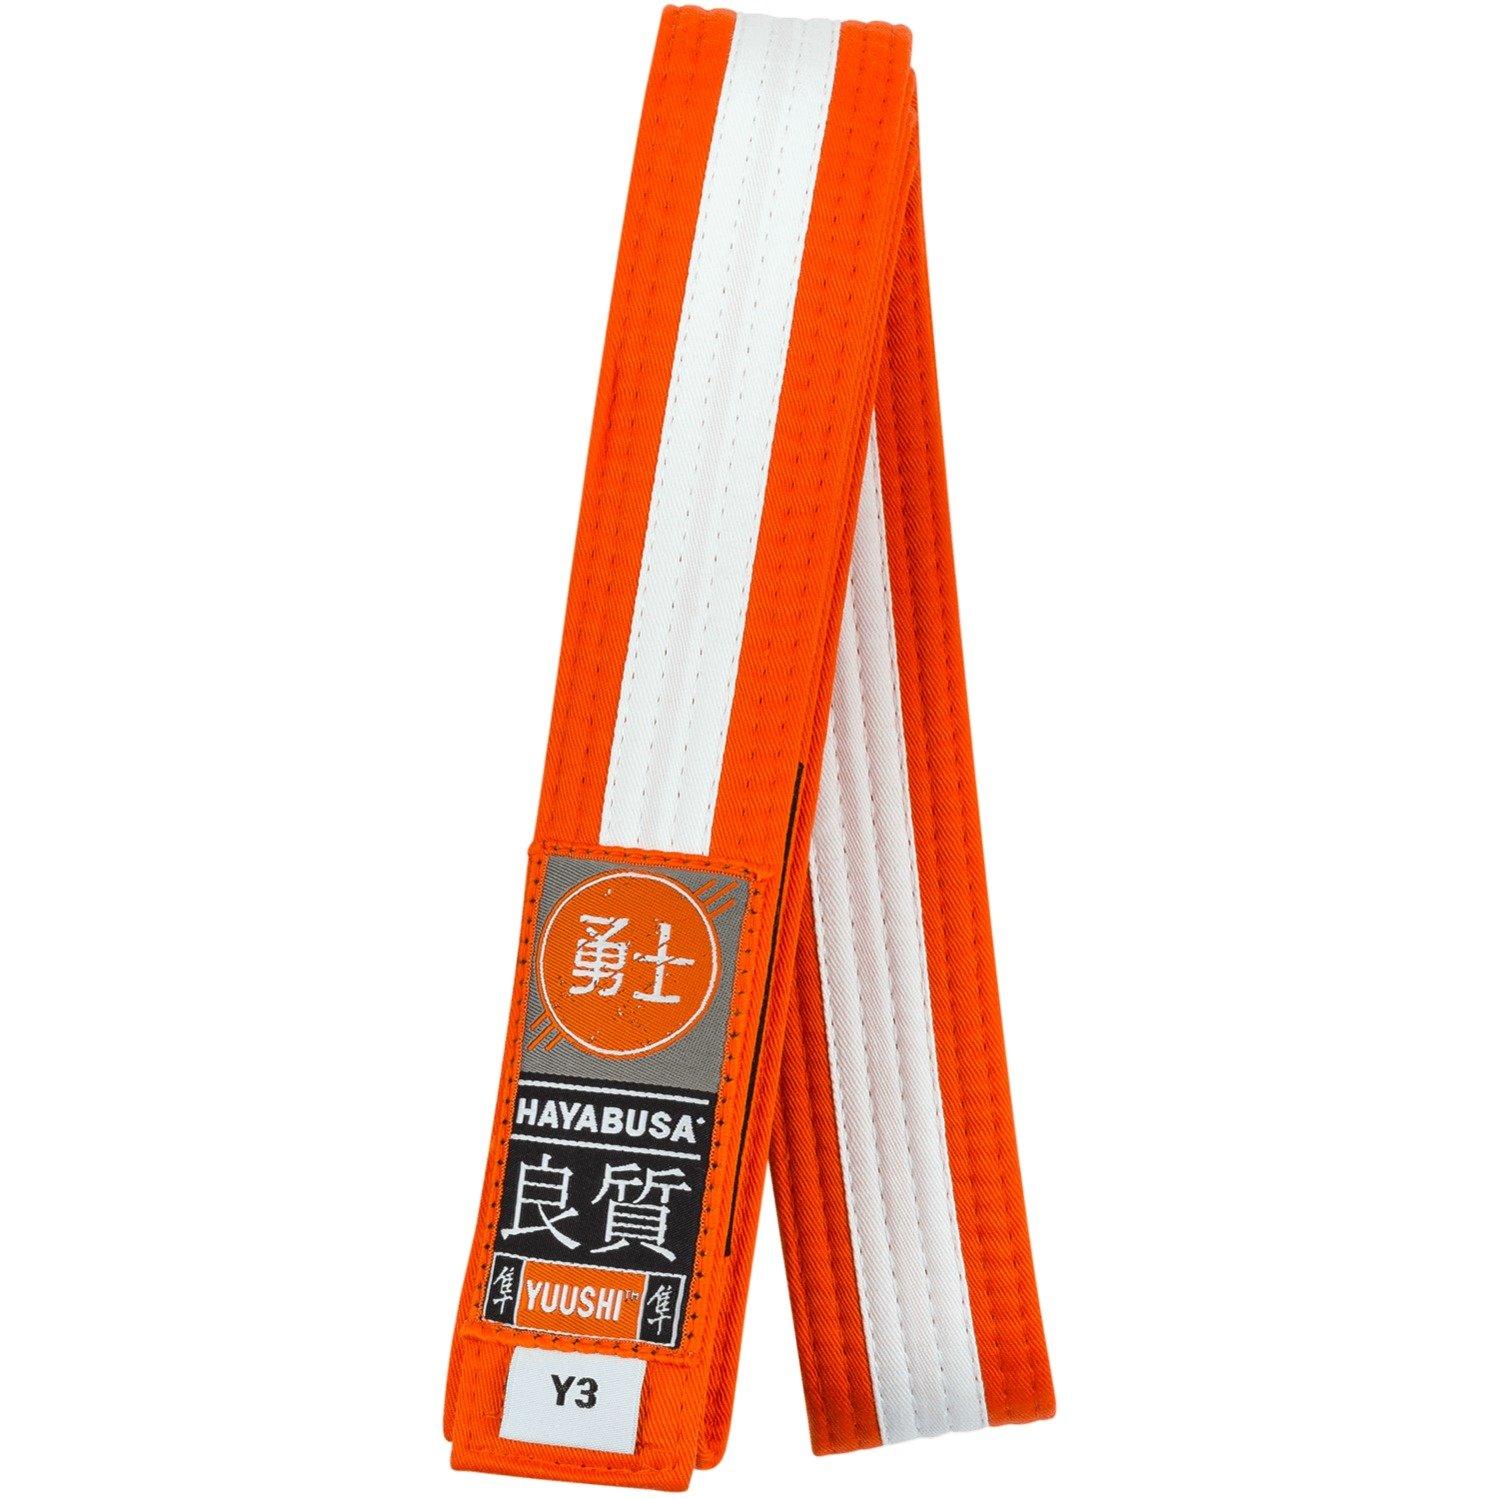 Hayabusa Cotton Youth Jiu Jitsu Belt, Orange w White Stripe, Y3 by Hayabusa